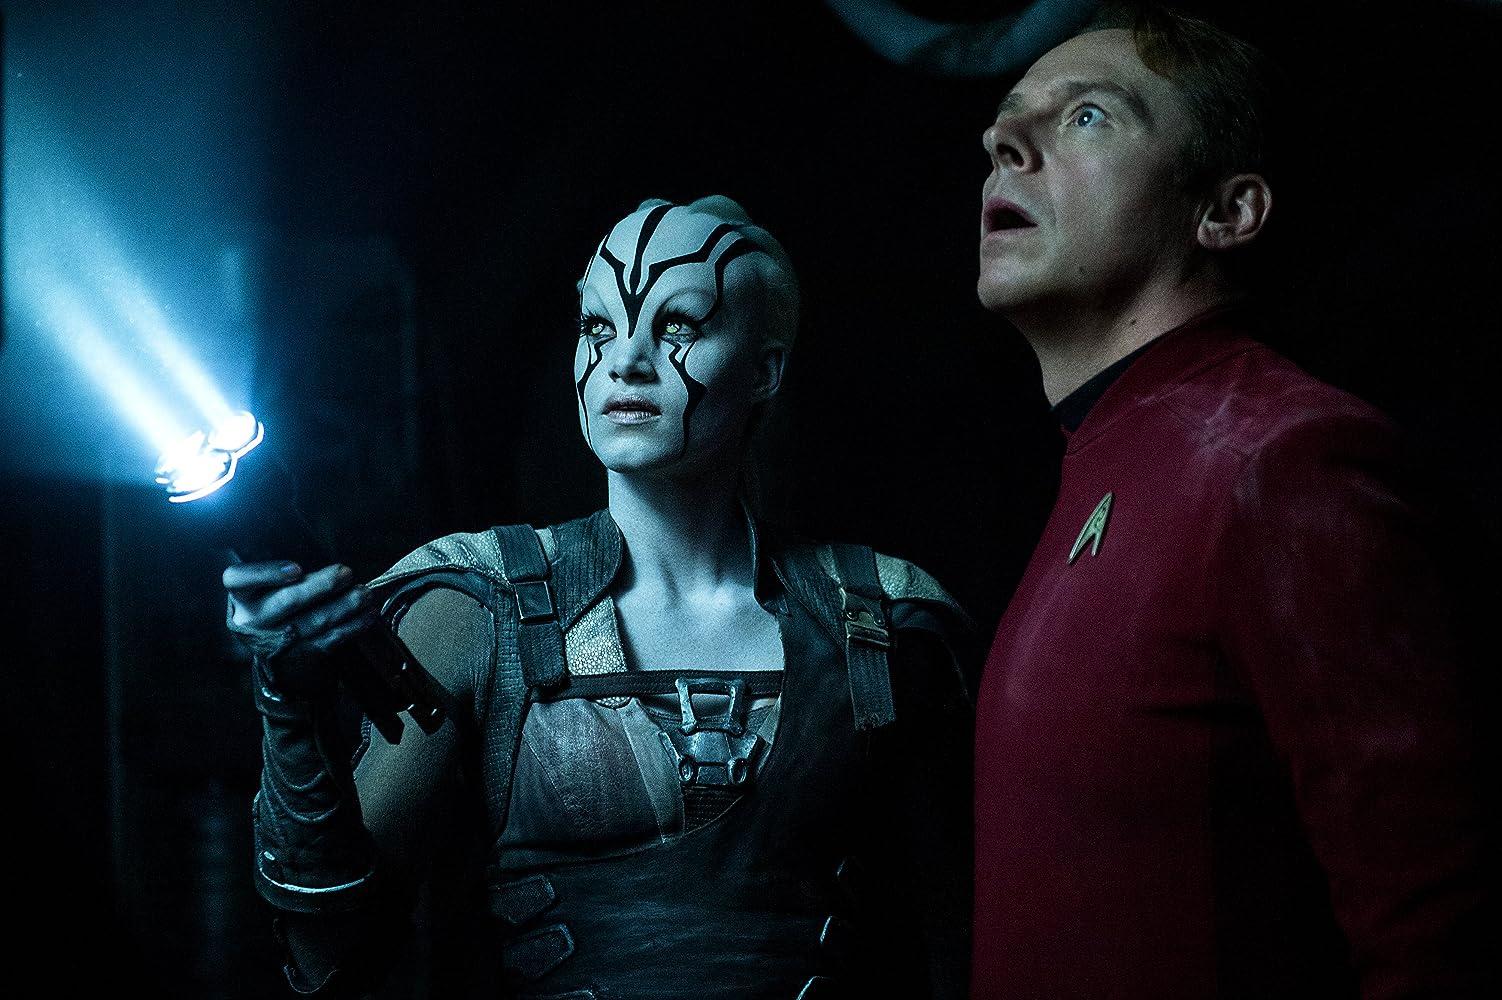 Simon Pegg and Sofia Boutella in Star Trek: Beyond (2016)